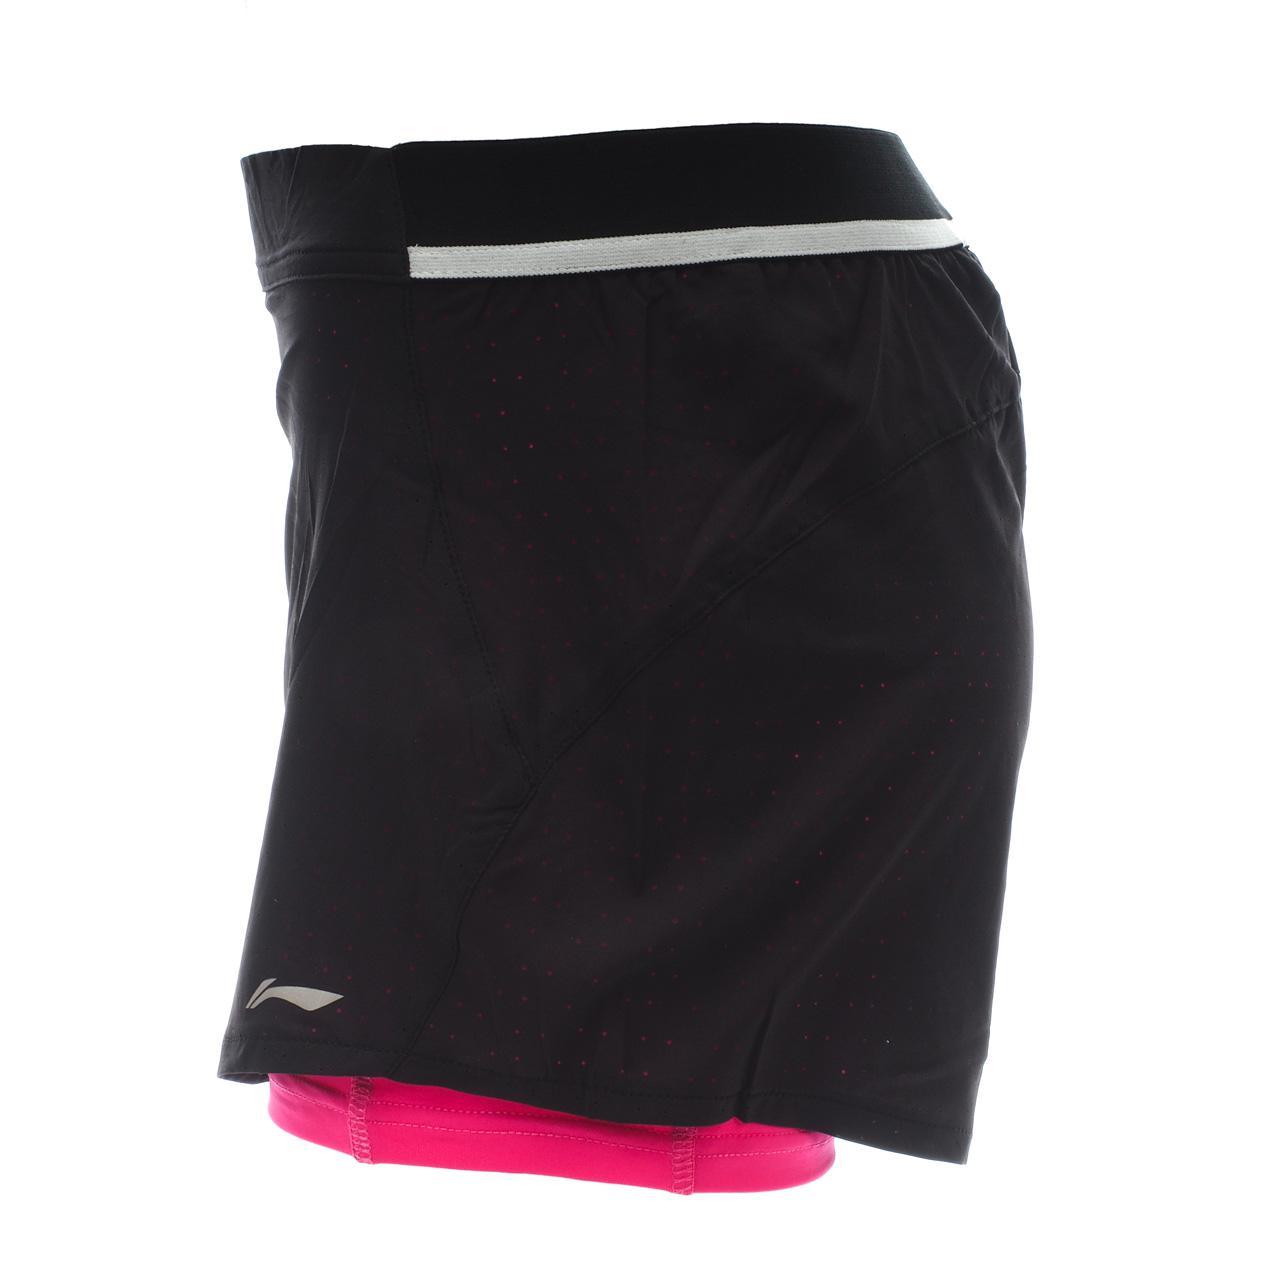 short-Laufen-Li-ning-Lolly-Nr-Rse-Shorts-Run-L-Schwarz-17898-Neu